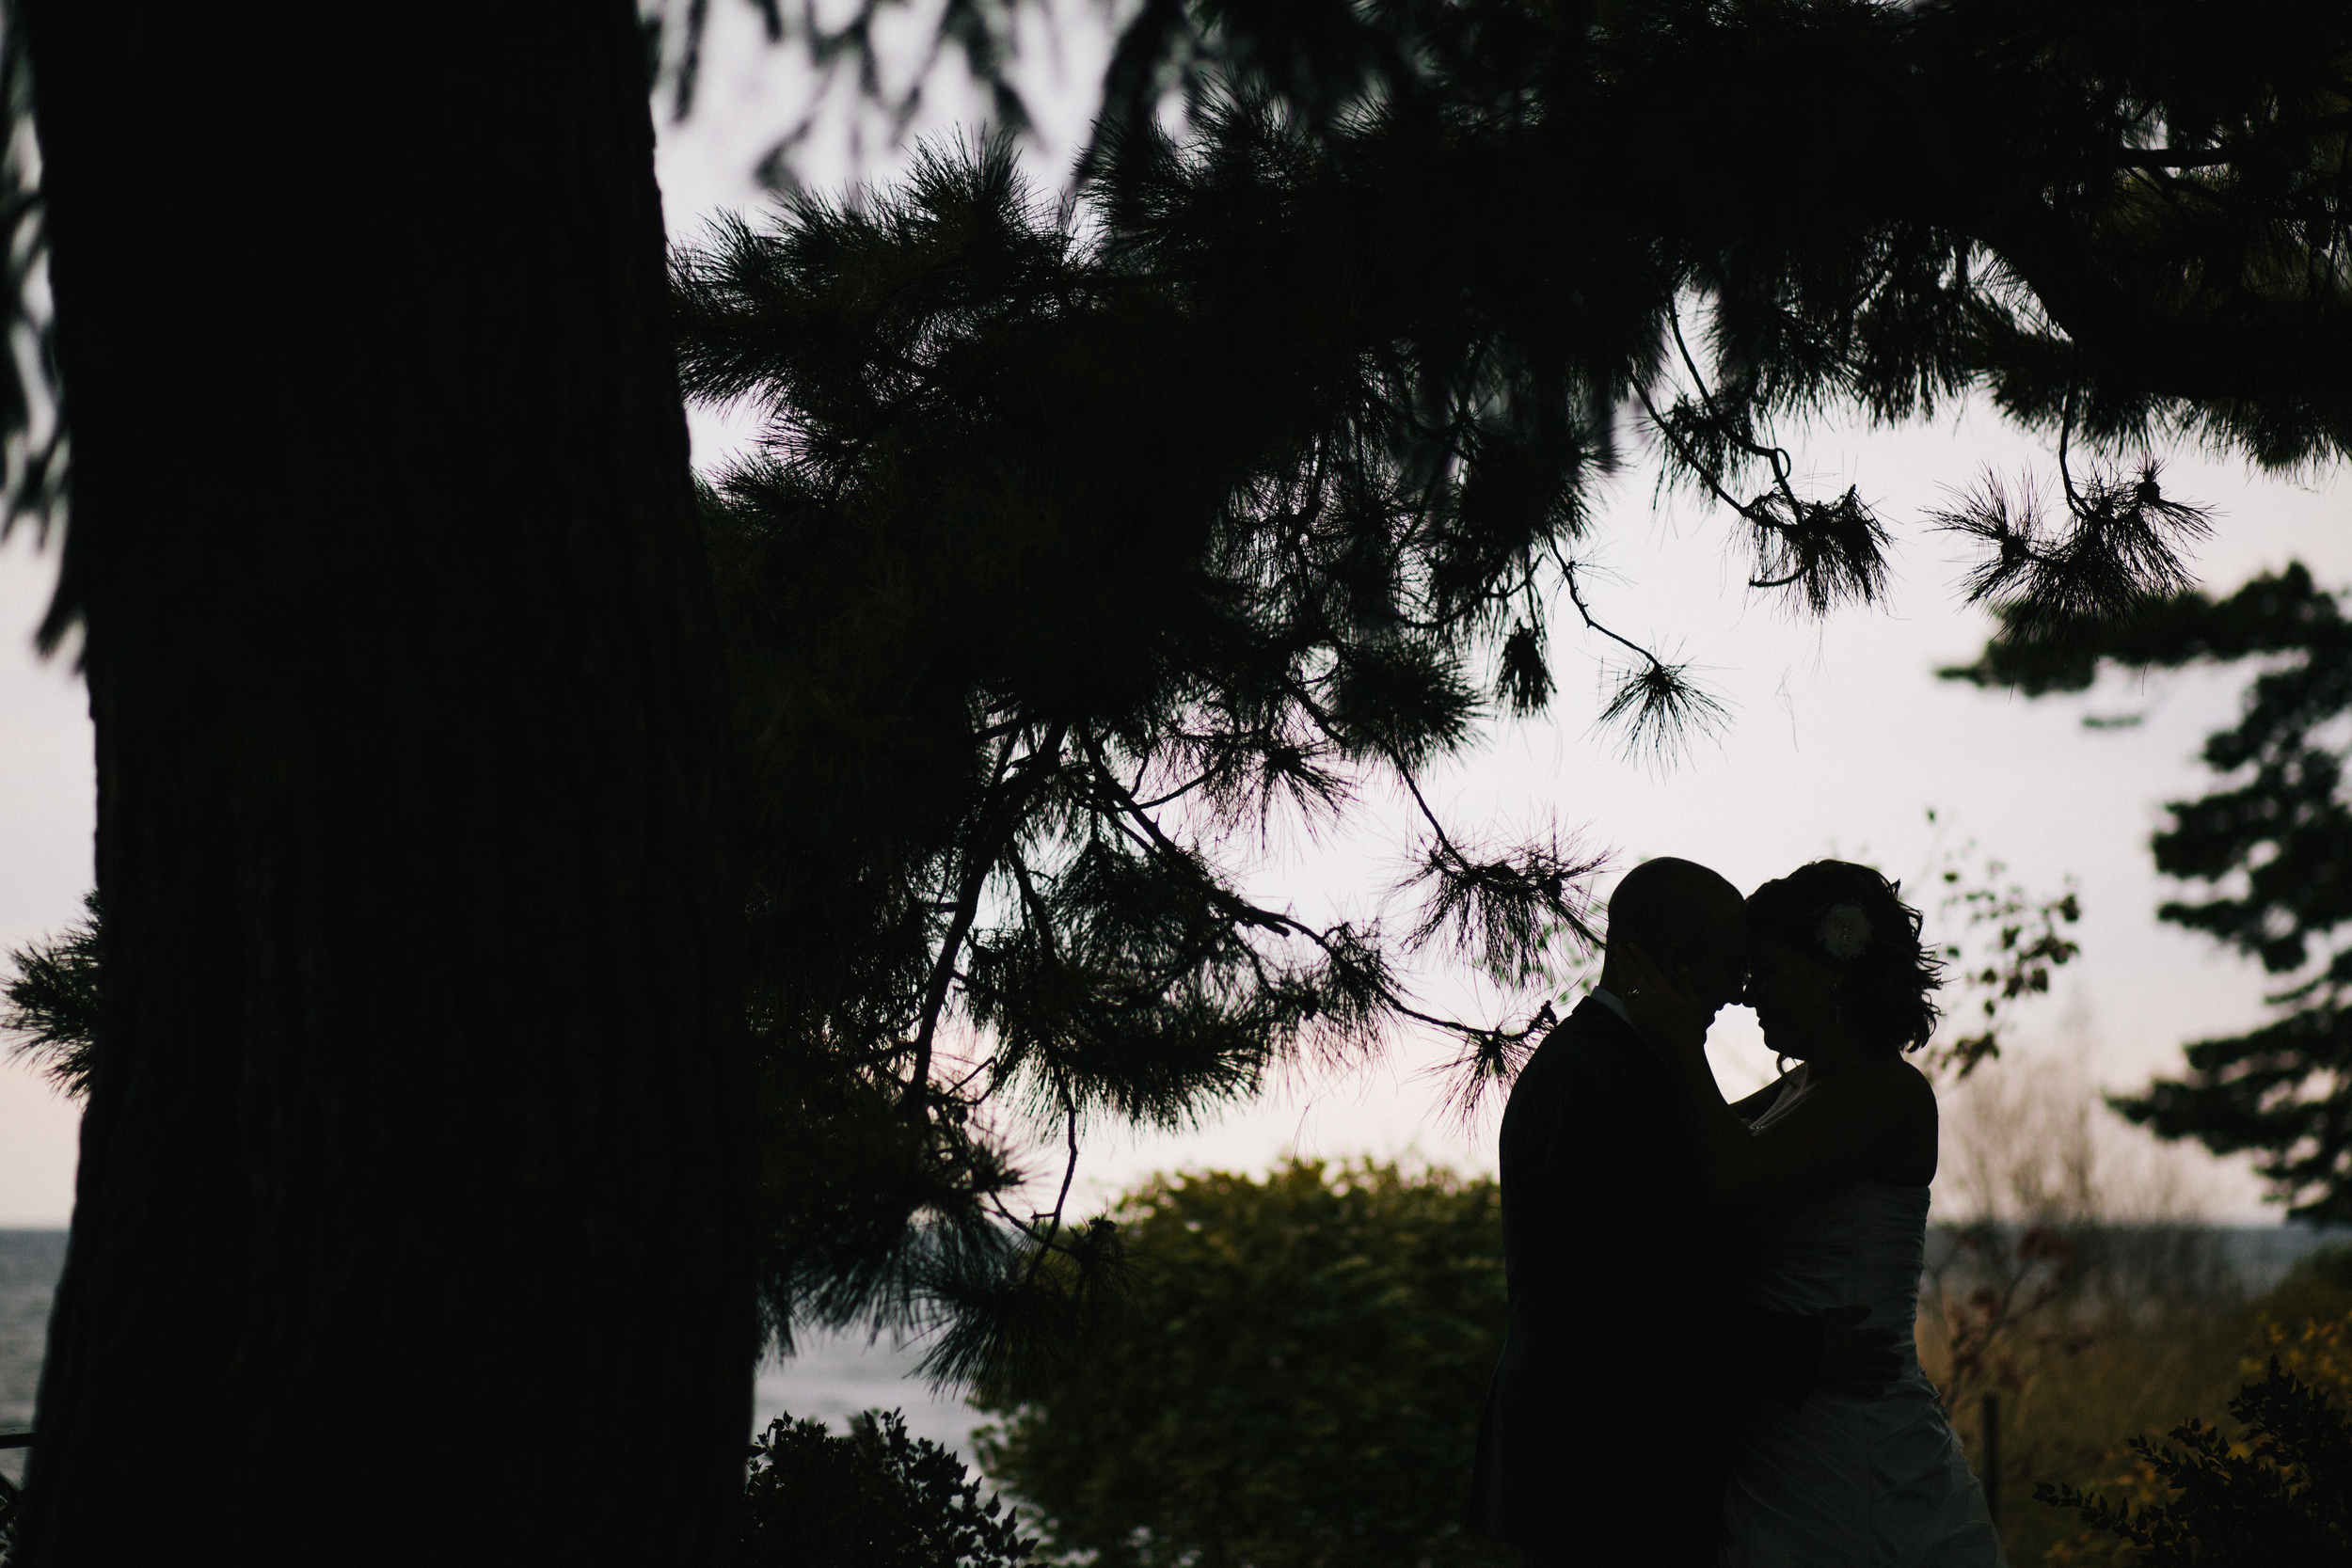 Stephanie-Kyle-paradise-banquet-hall-michael-rousseau-photography-best-toronto-wedding-photographer-documentary-wedding032.JPG